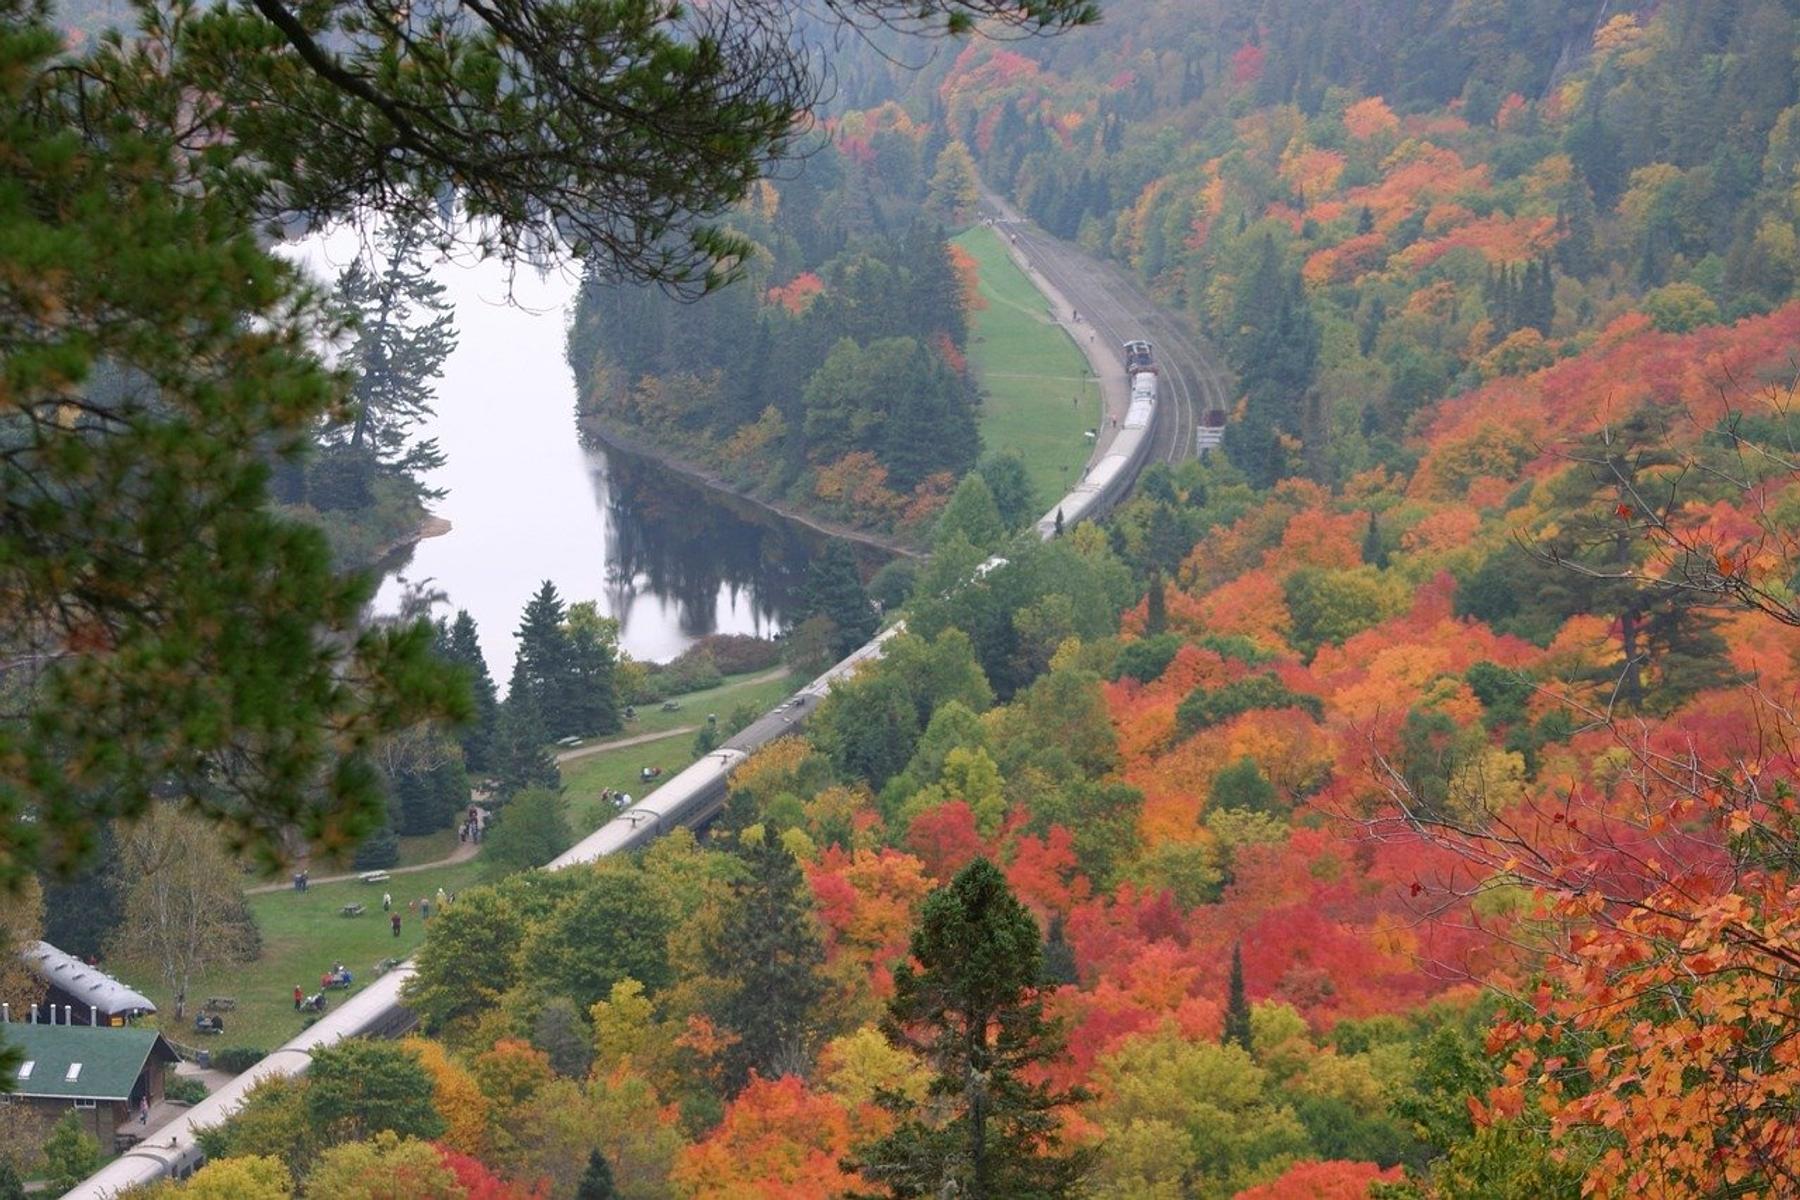 train route and fall foliage at Agawa Canyon in Ontario